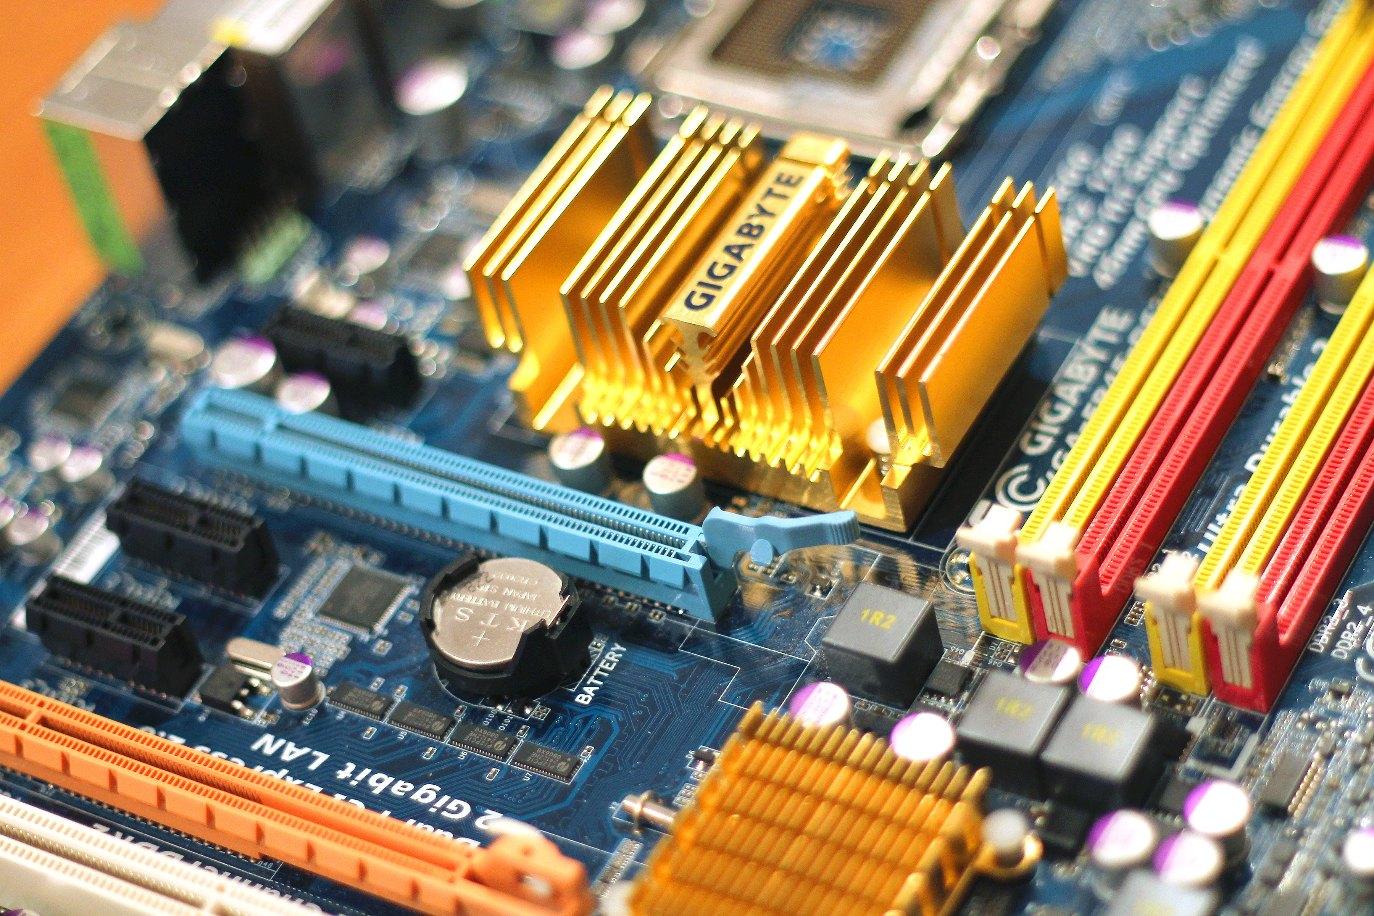 Arcadia FL Onsite PC & Printer Repair, Networks, Voice & Data Cabling Services